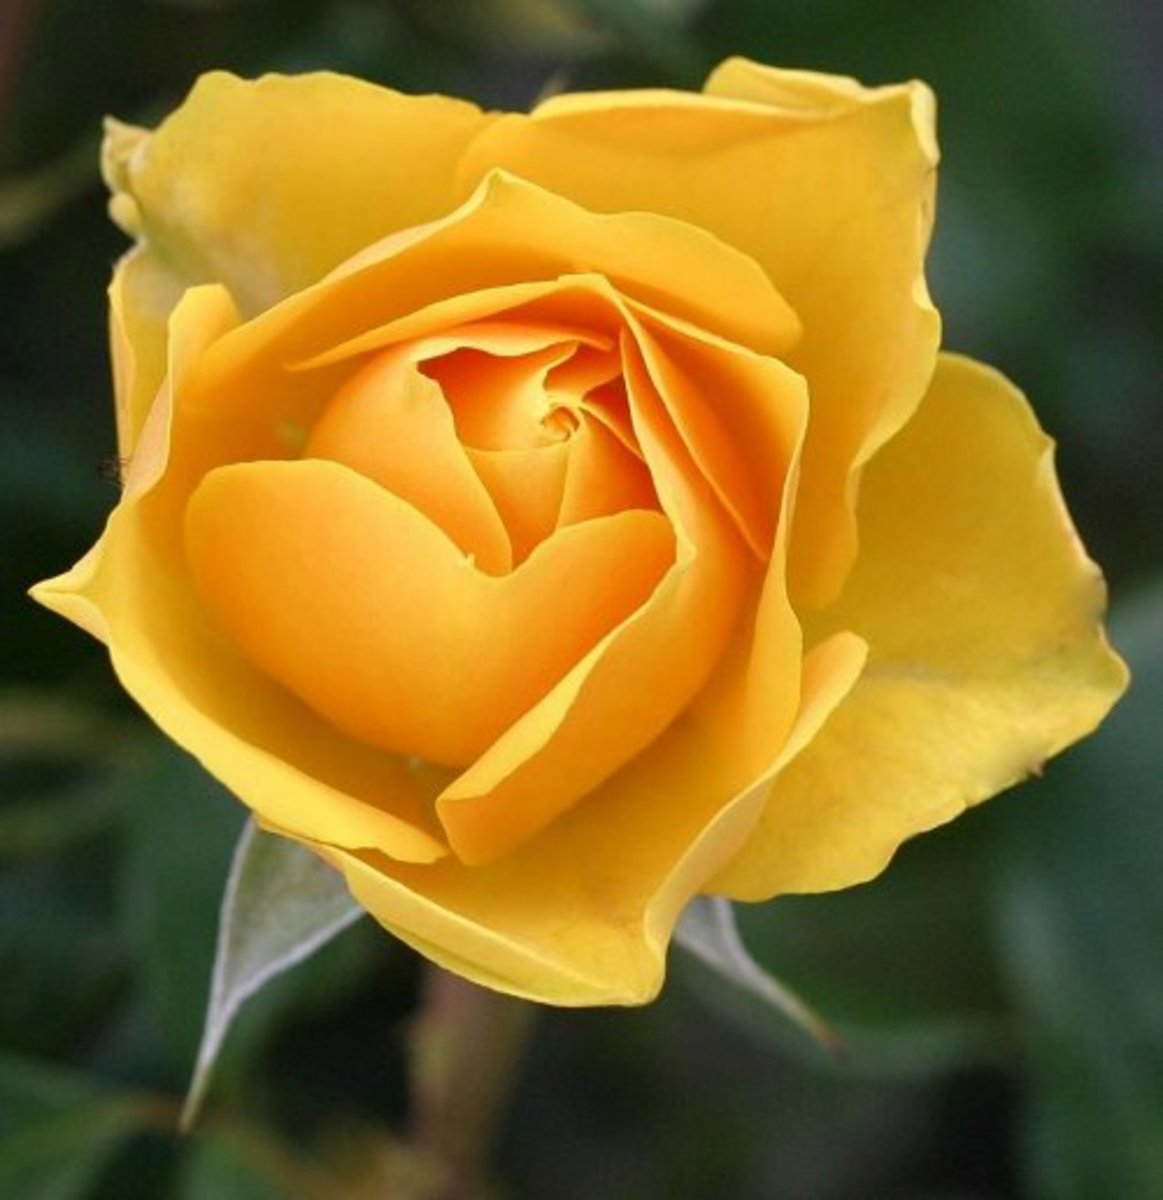 Single golden yellow orange rose flower